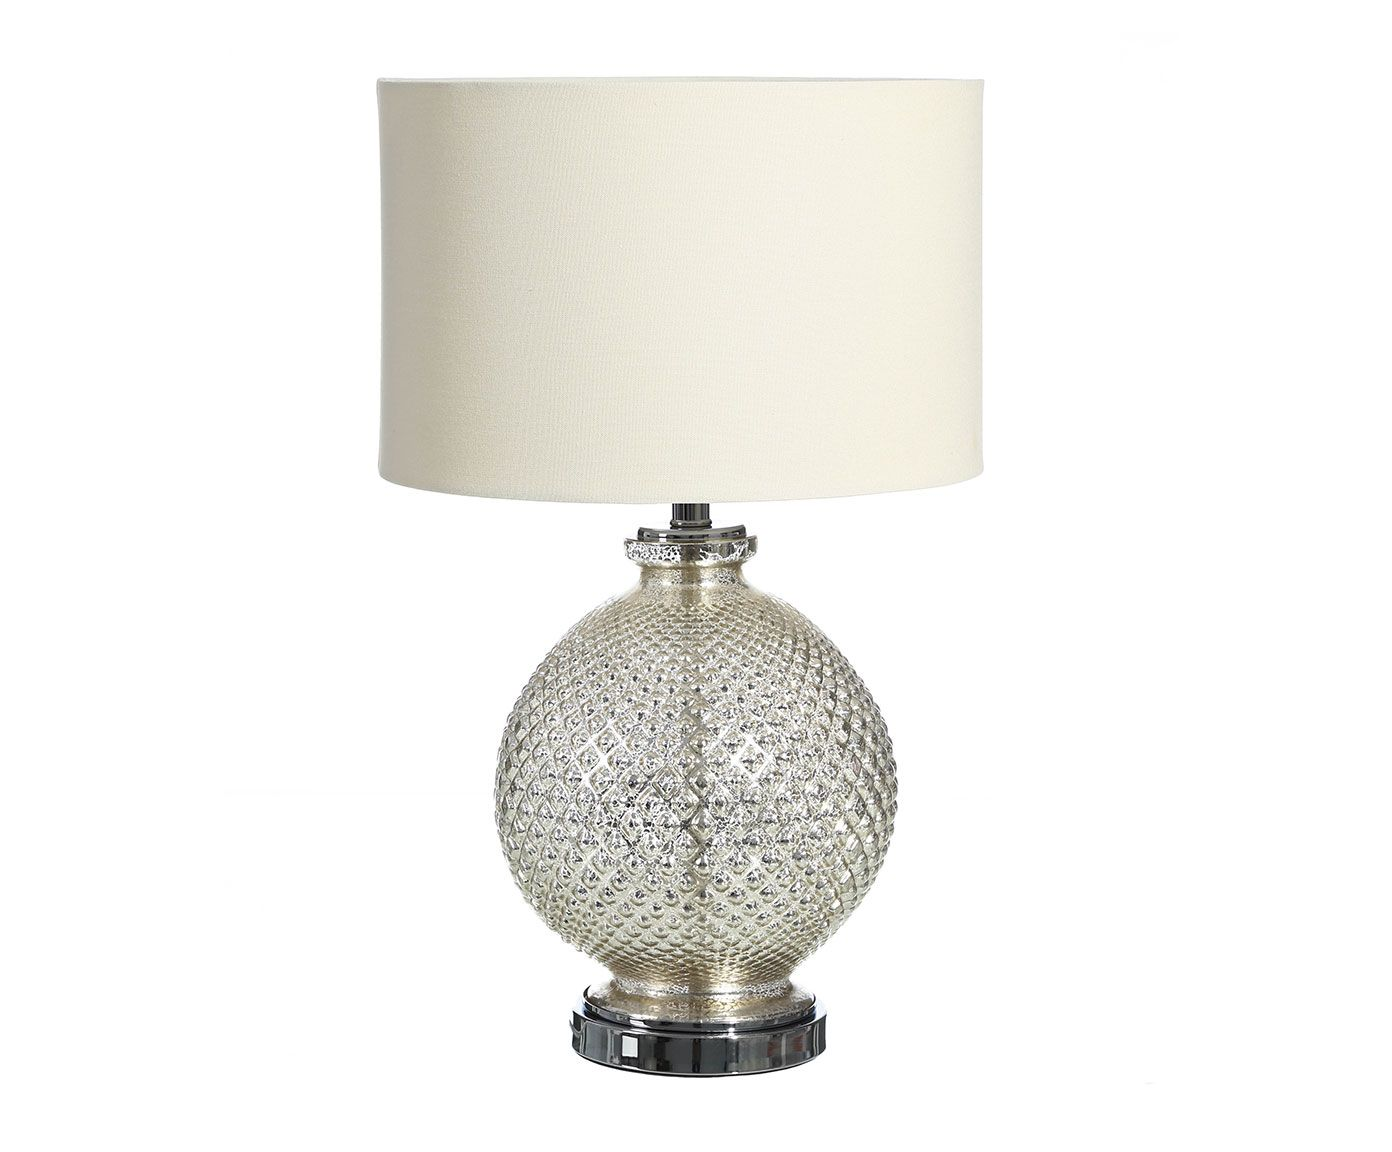 Lámpara de sobremesa Julieta, plateado - altura 26 cm | Westwing Home & Living